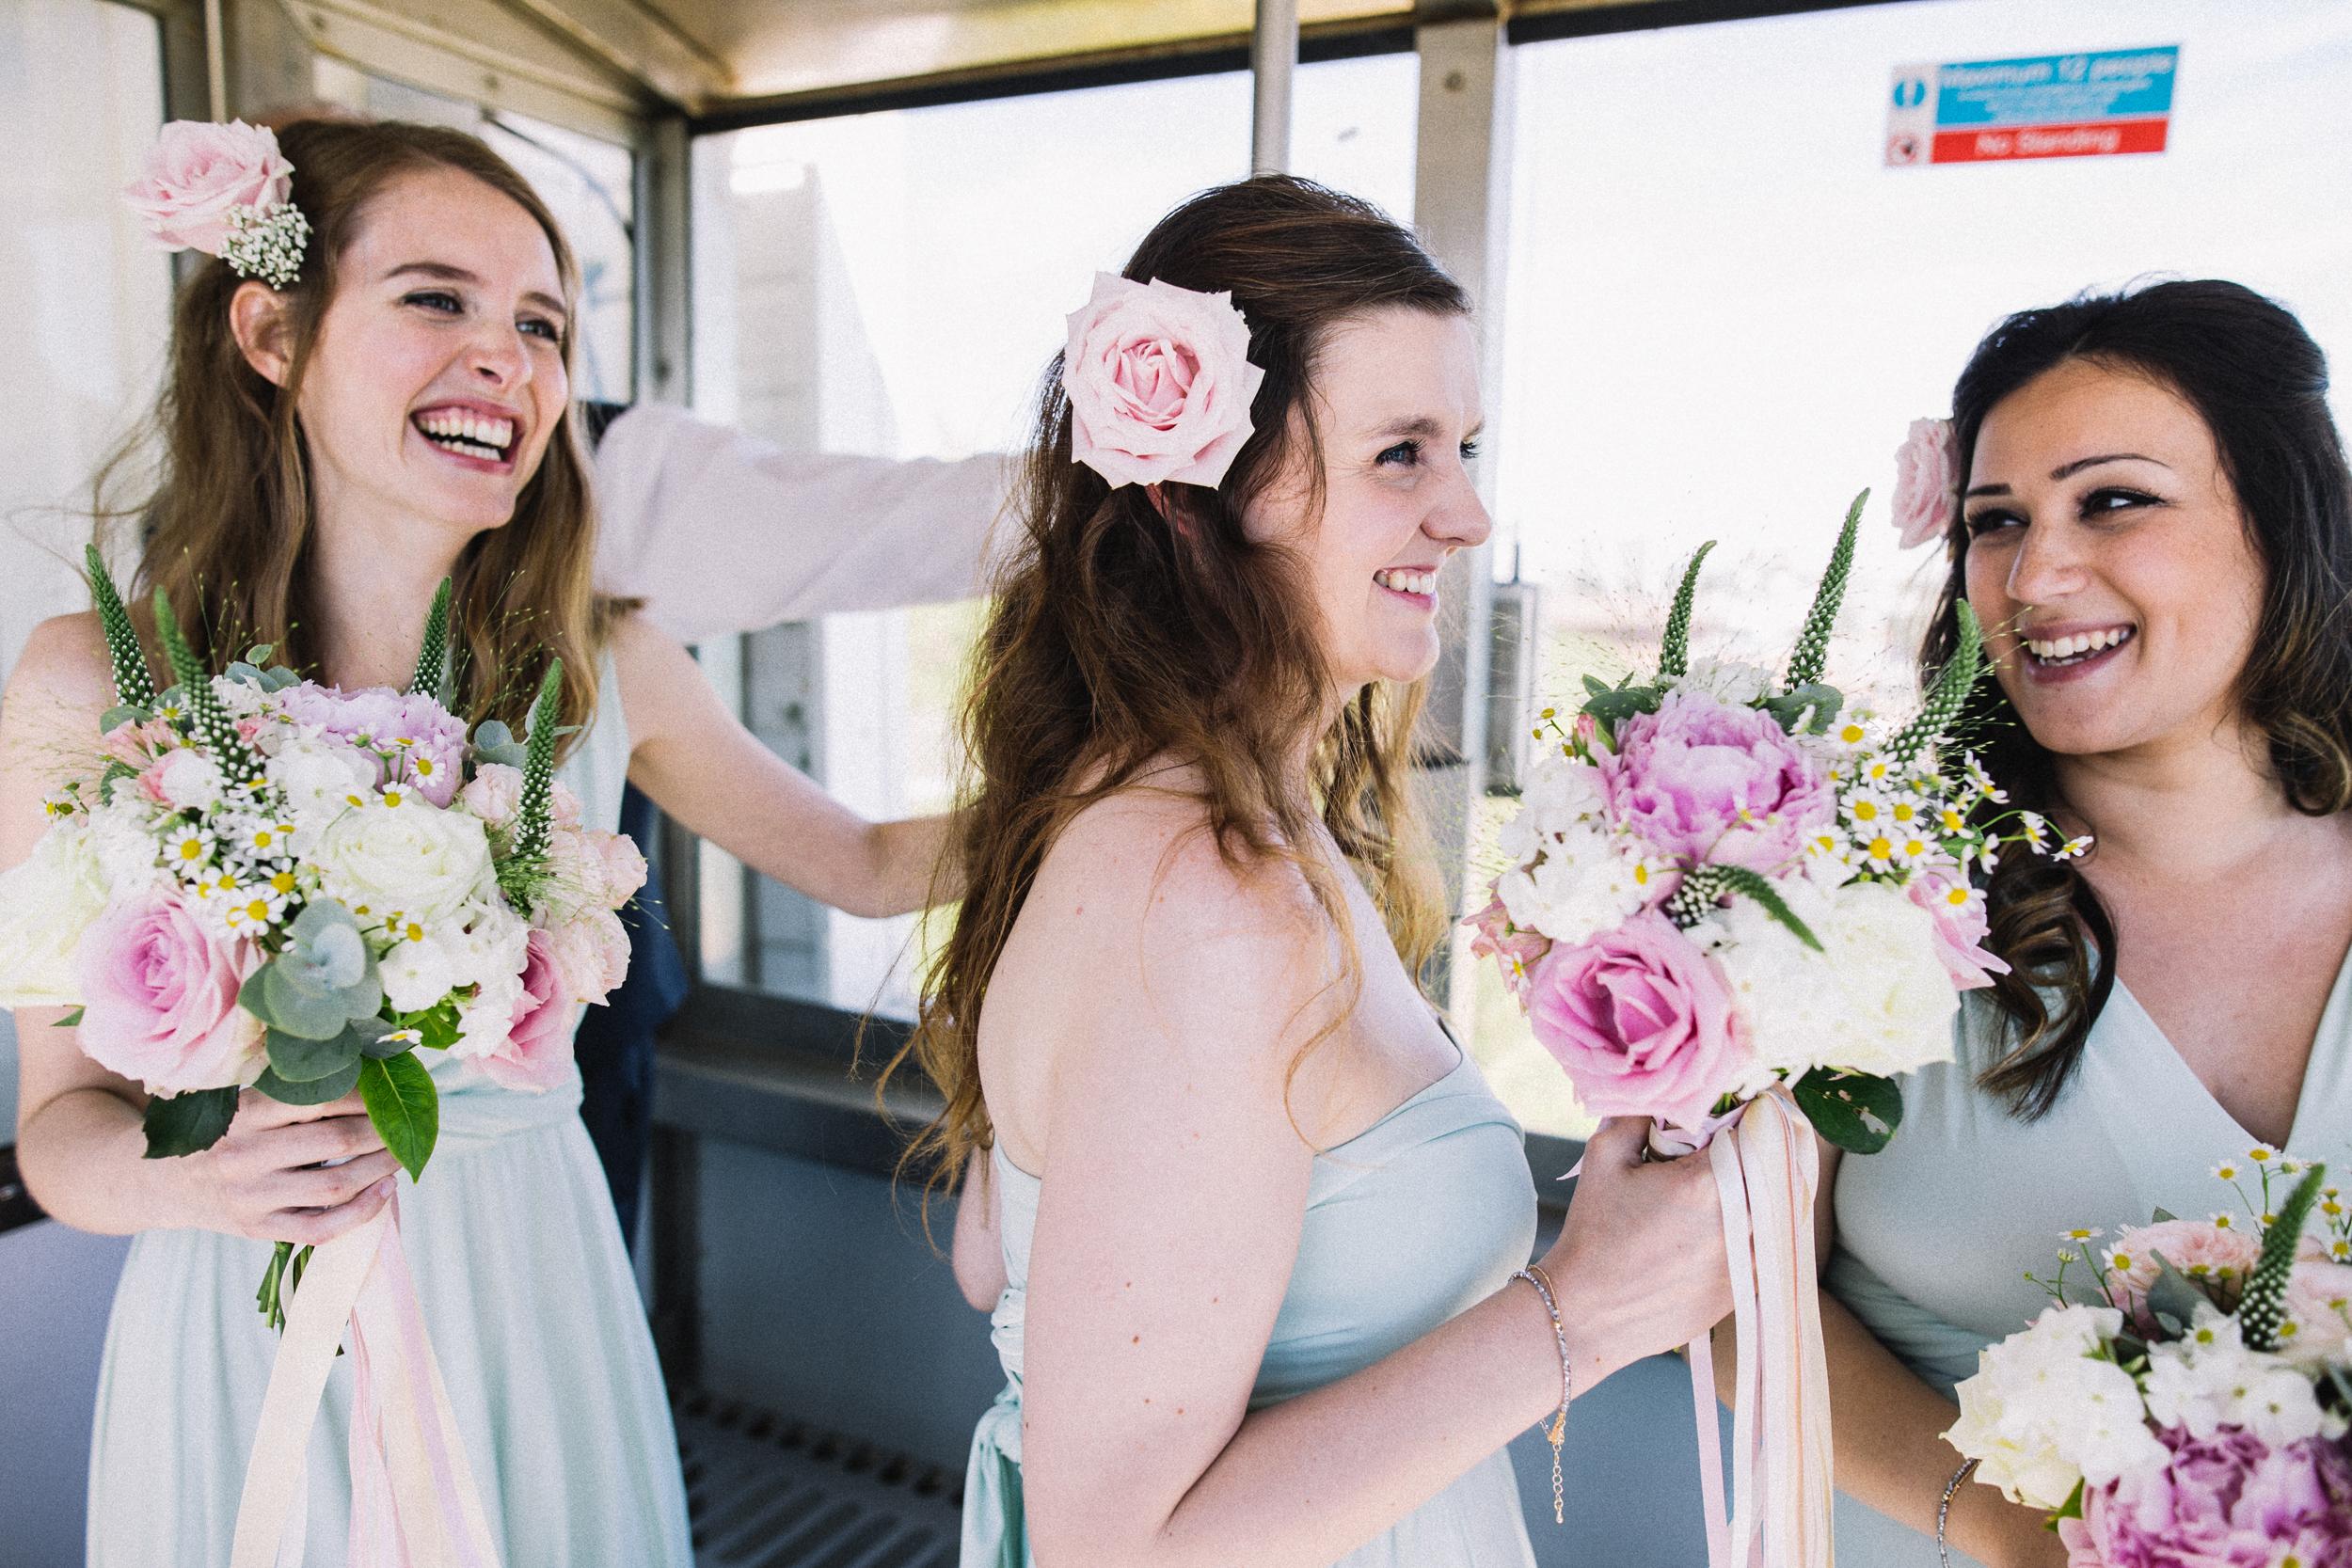 creative-wedding-photography-teesside-north-east-yorkshire-85.jpg